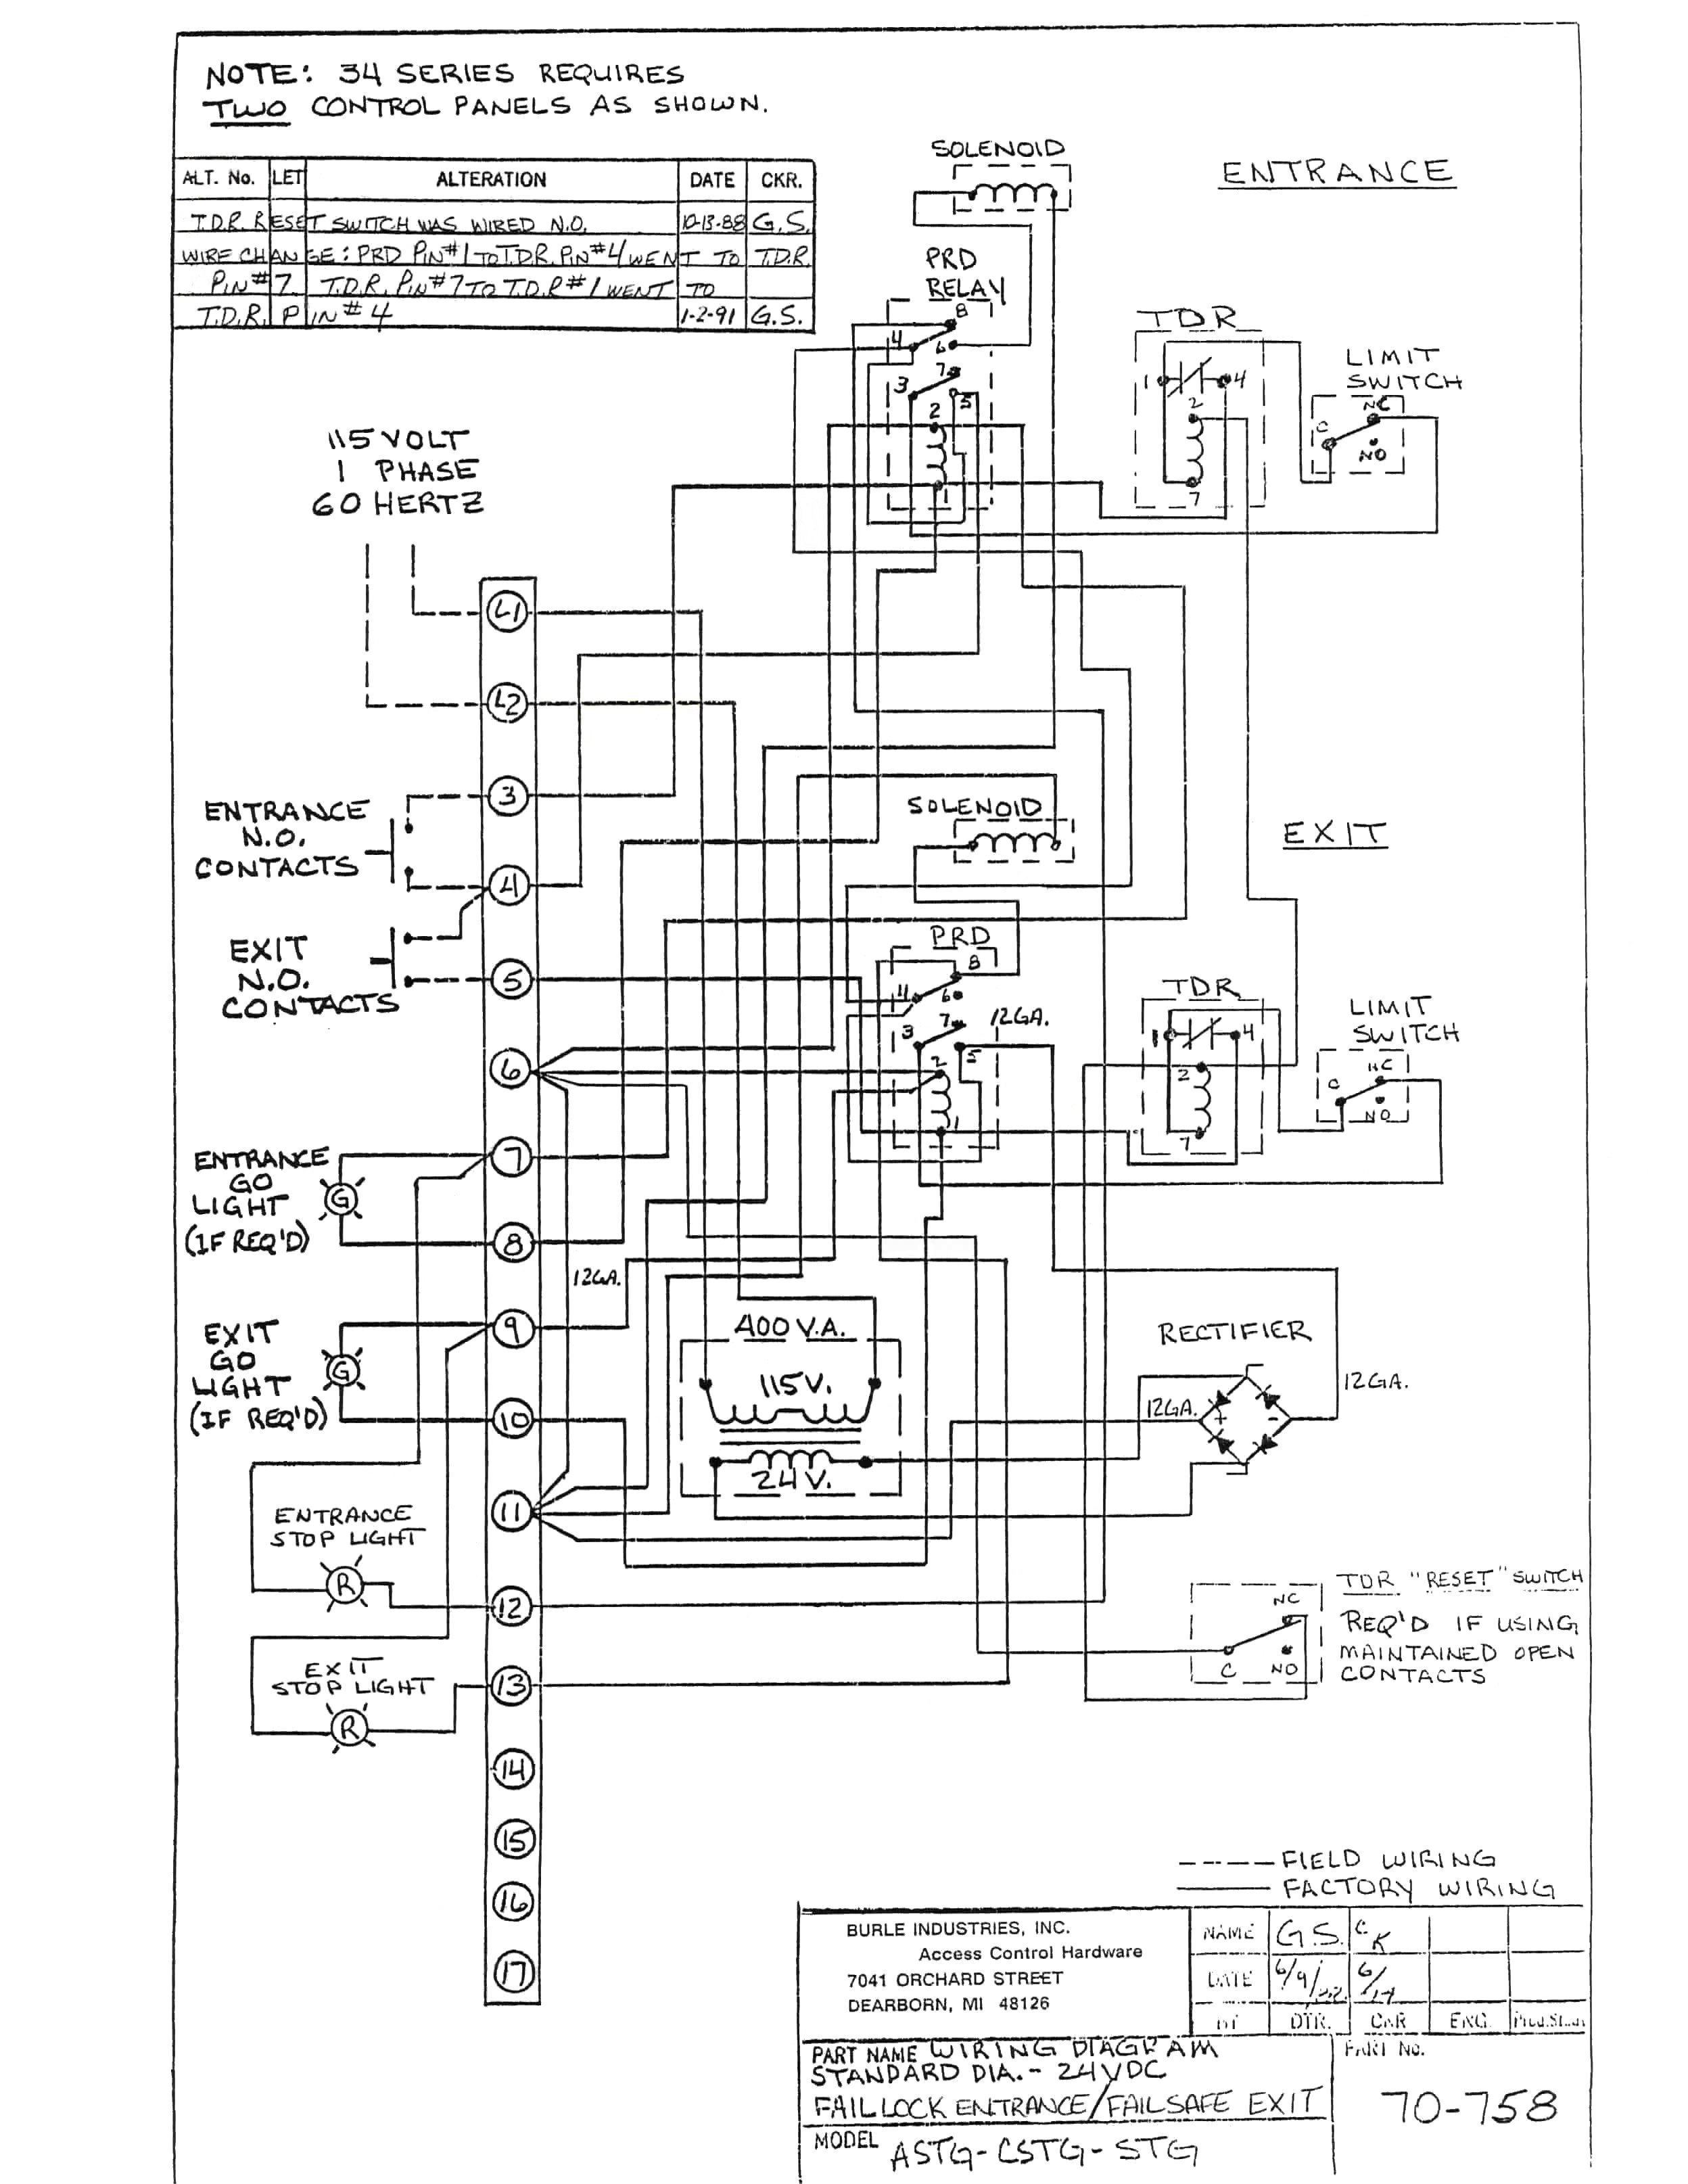 Trane Heat Pump Wiring 55839 furthermore Trane Xe 1200 Manual moreover Wiring Thermostat Honeywell 8320u Furnace Heat Pump Trane Xe78 Xe1000  bo 165535 further Trane Weathertron Thermostat Wiring Diagram likewise Trane Xt500c Thermostat Wiring Diagram. on baystat 239 manual